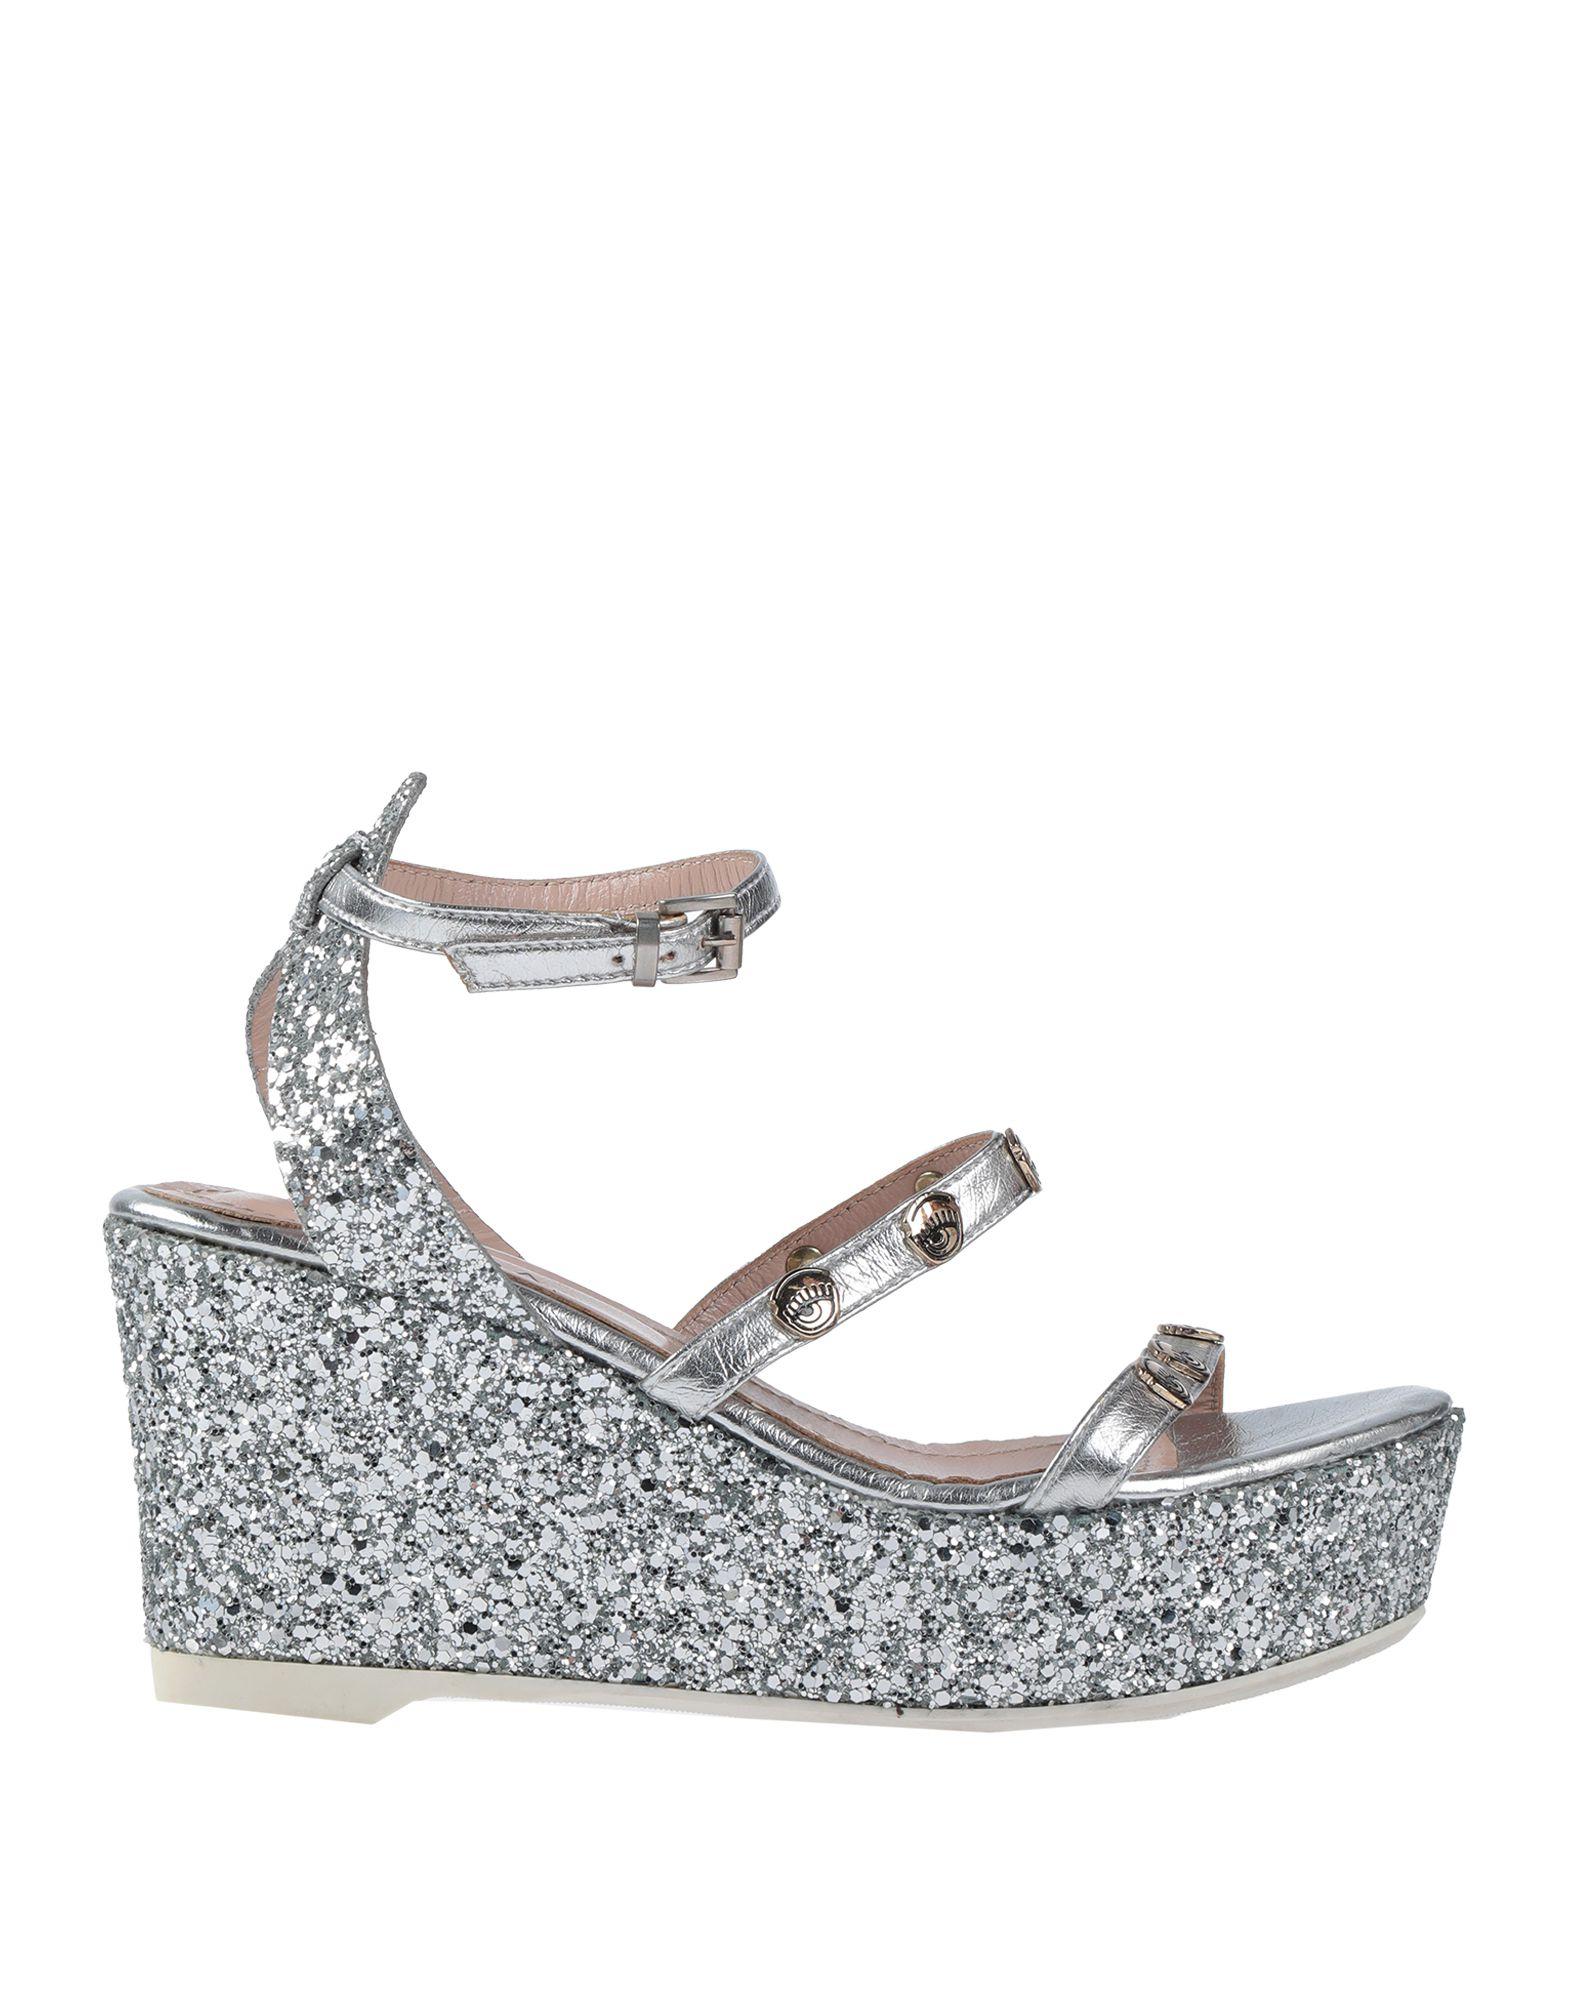 size UK 4 CHIARA FERRAGNI Women/'s Black Wedge Heels Platform Sandals